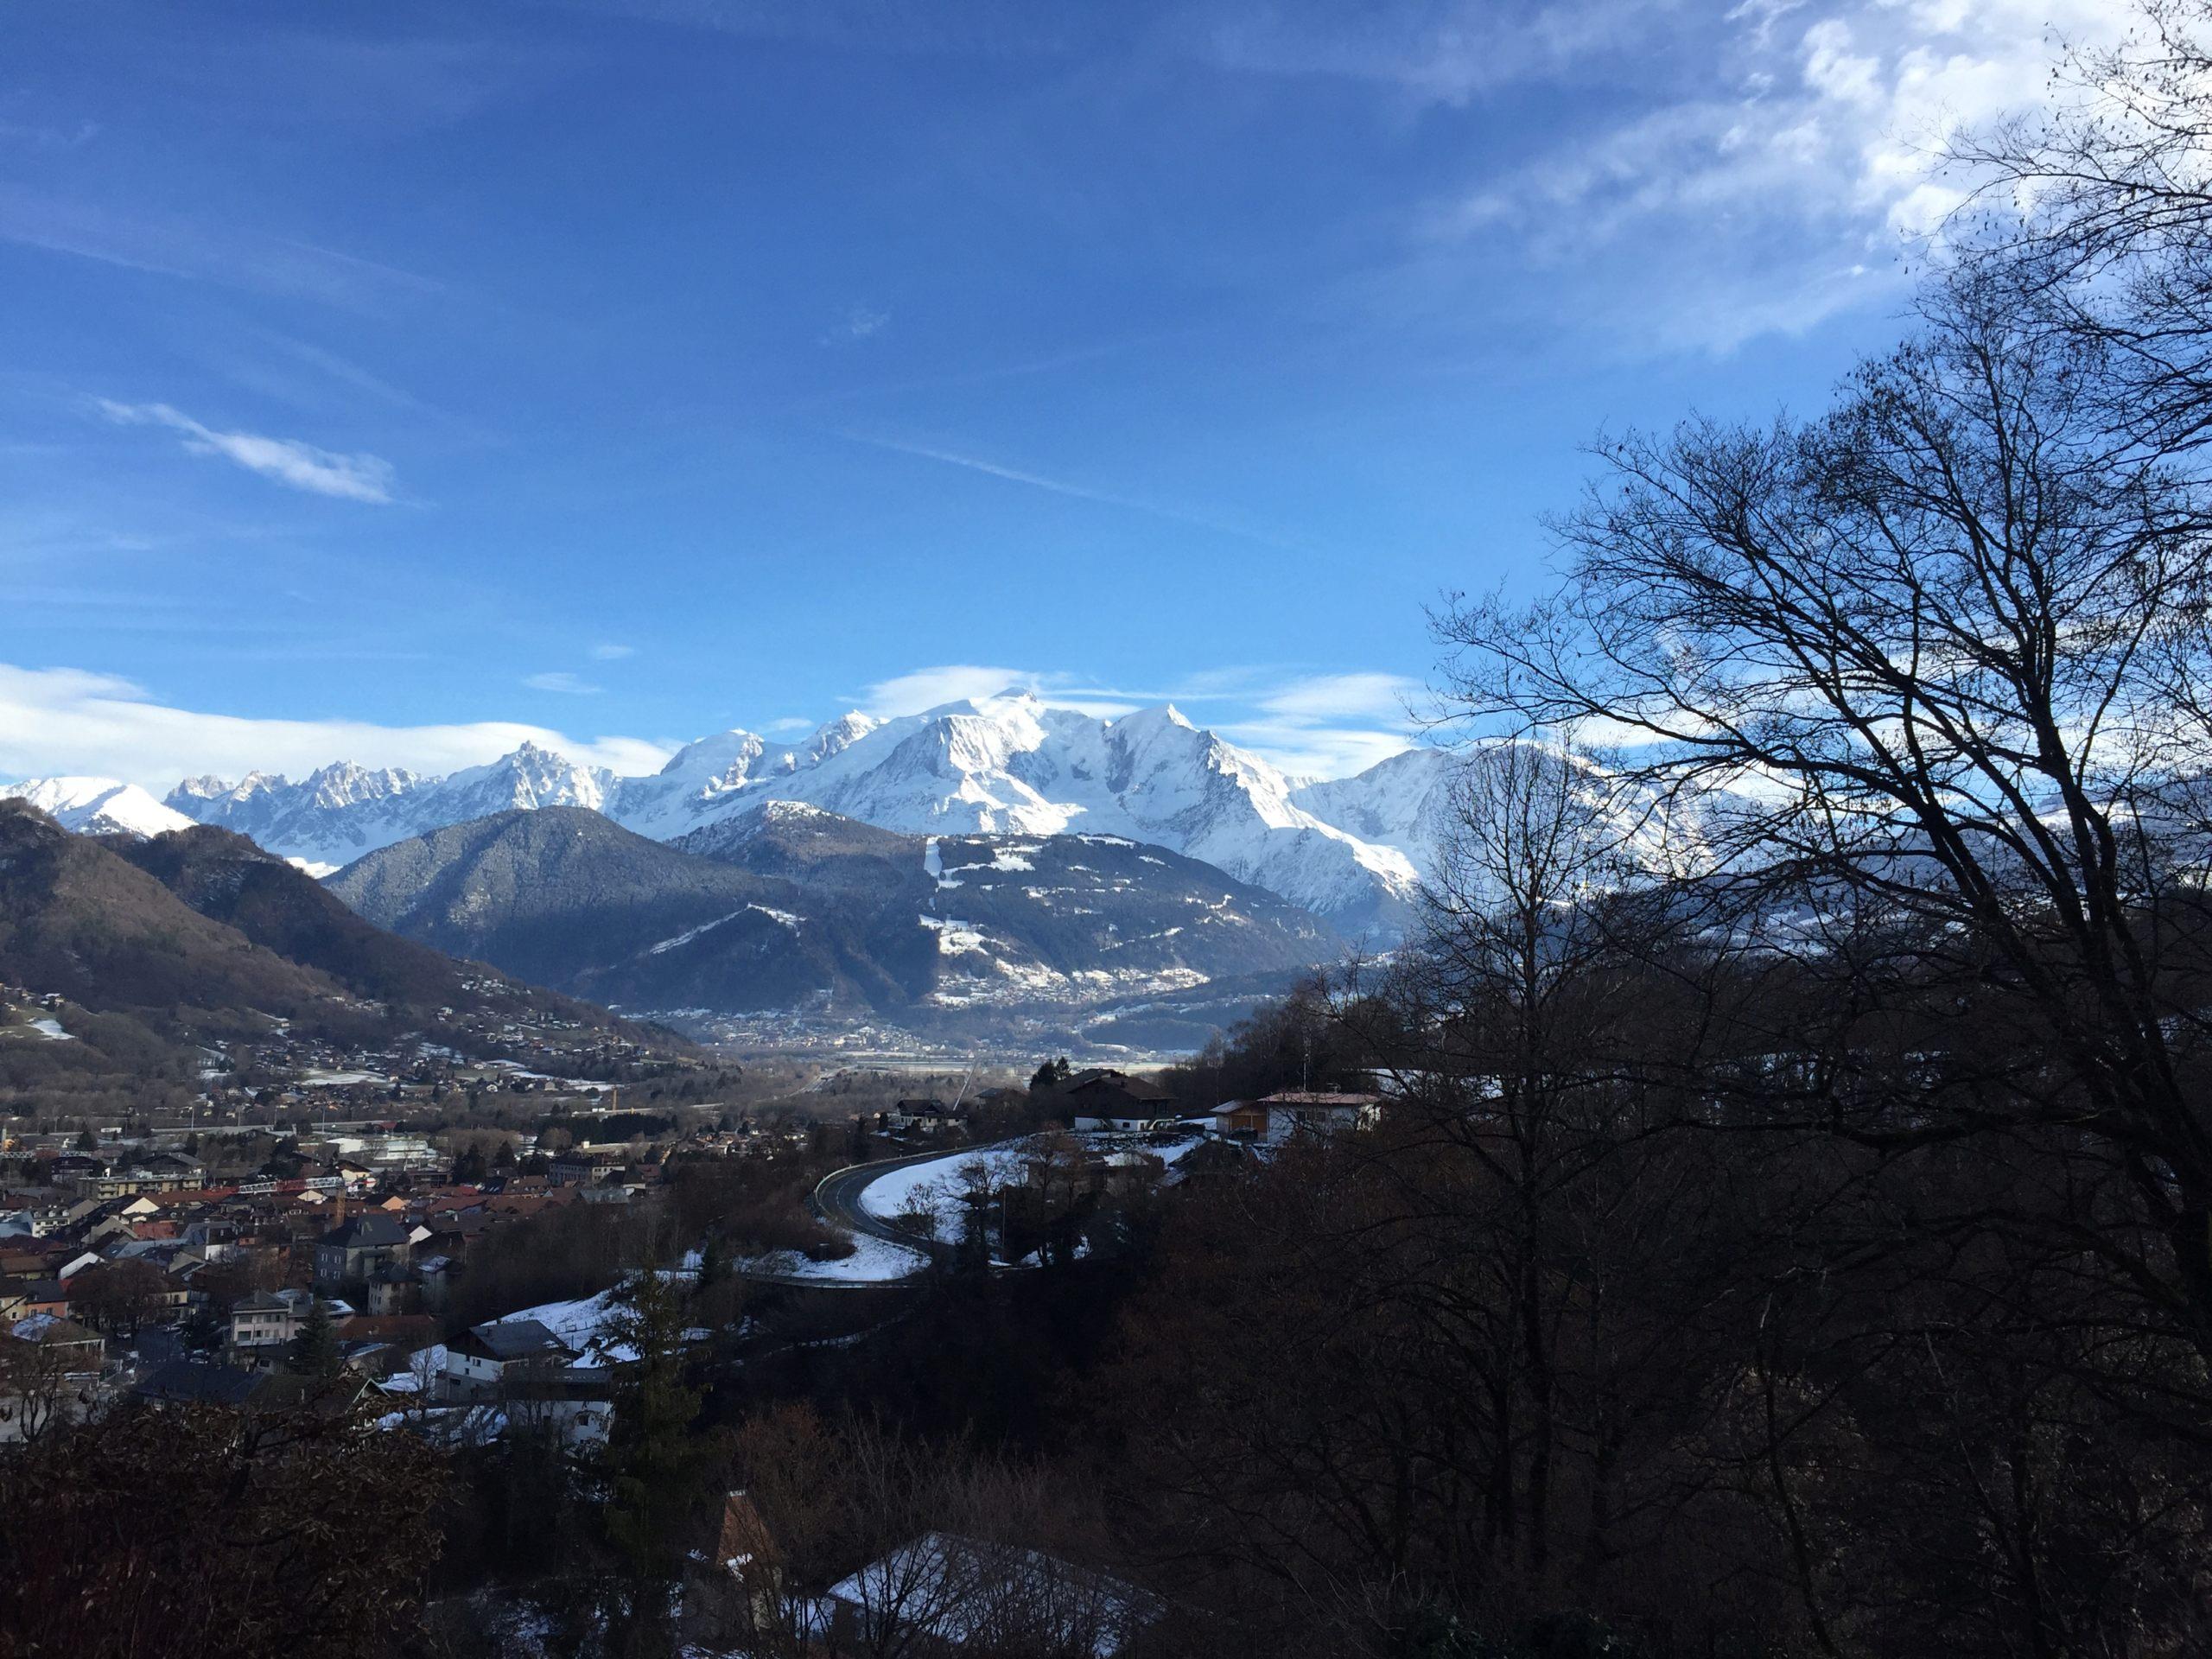 Petites balades en Rhône-Alpes - Page 2 Img_8510